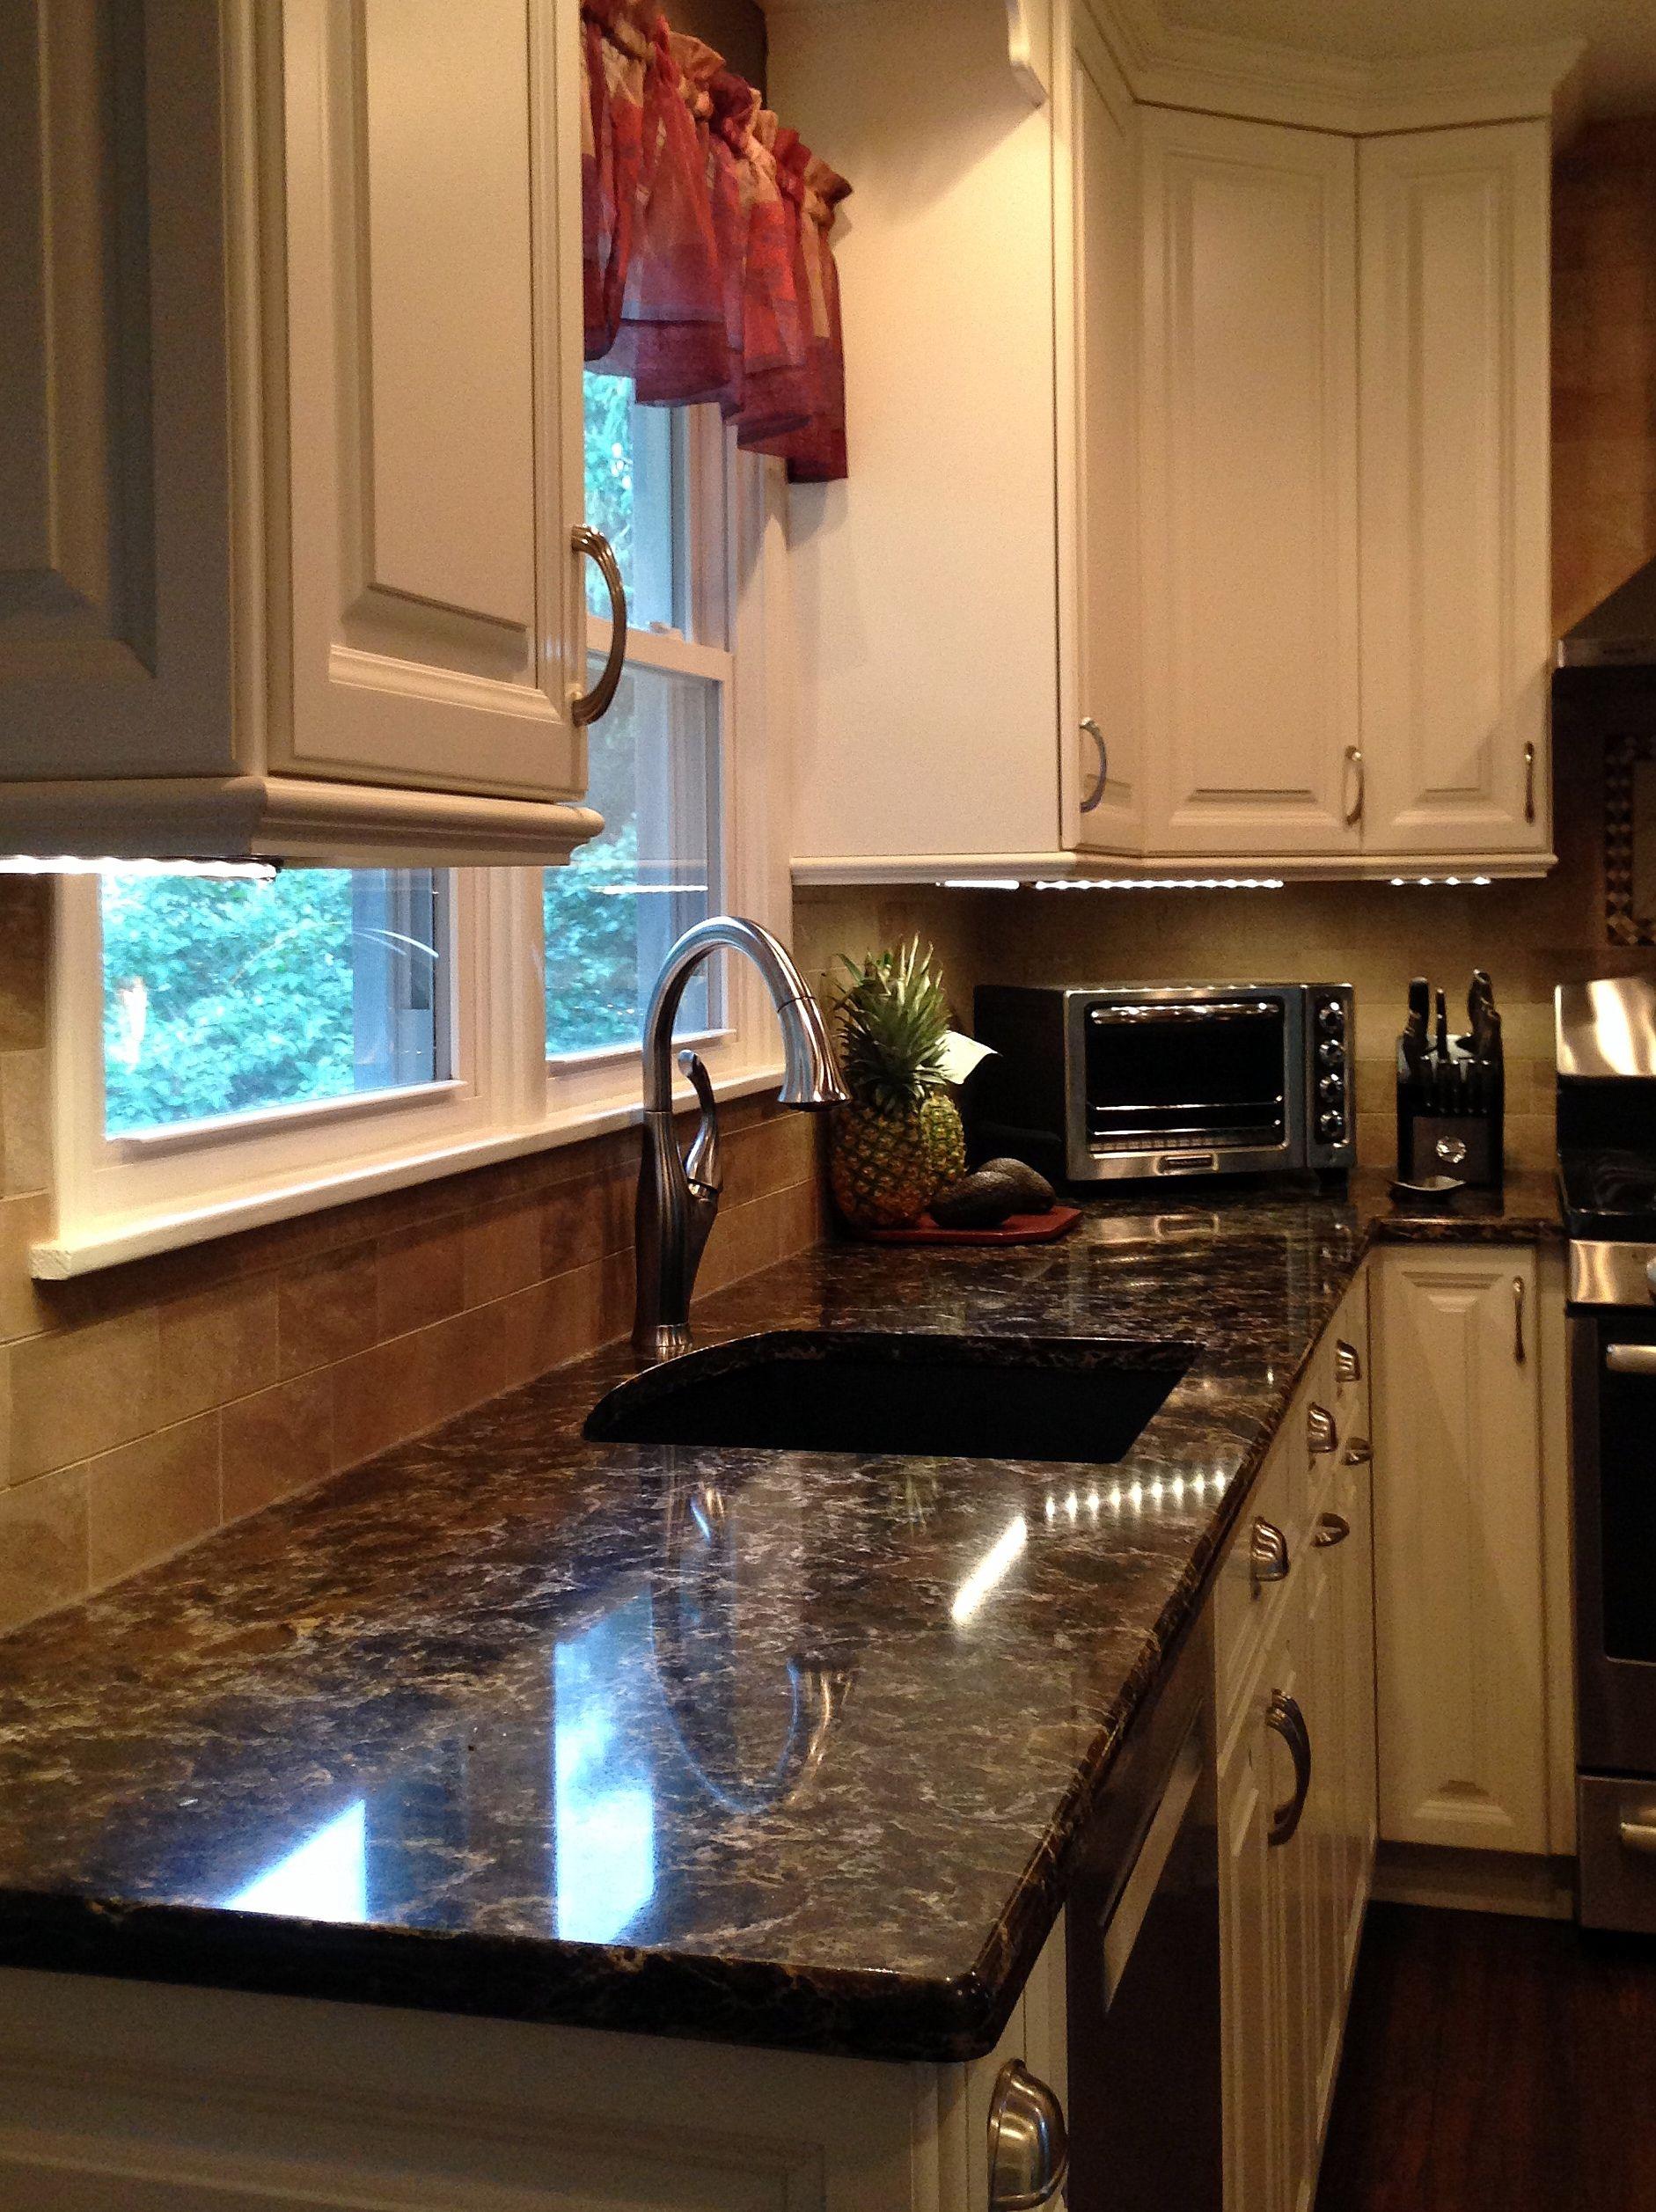 Nice White Millbrook Kitchen With Laneshaw Quartz Countertops (10 Of 10) Good Ideas